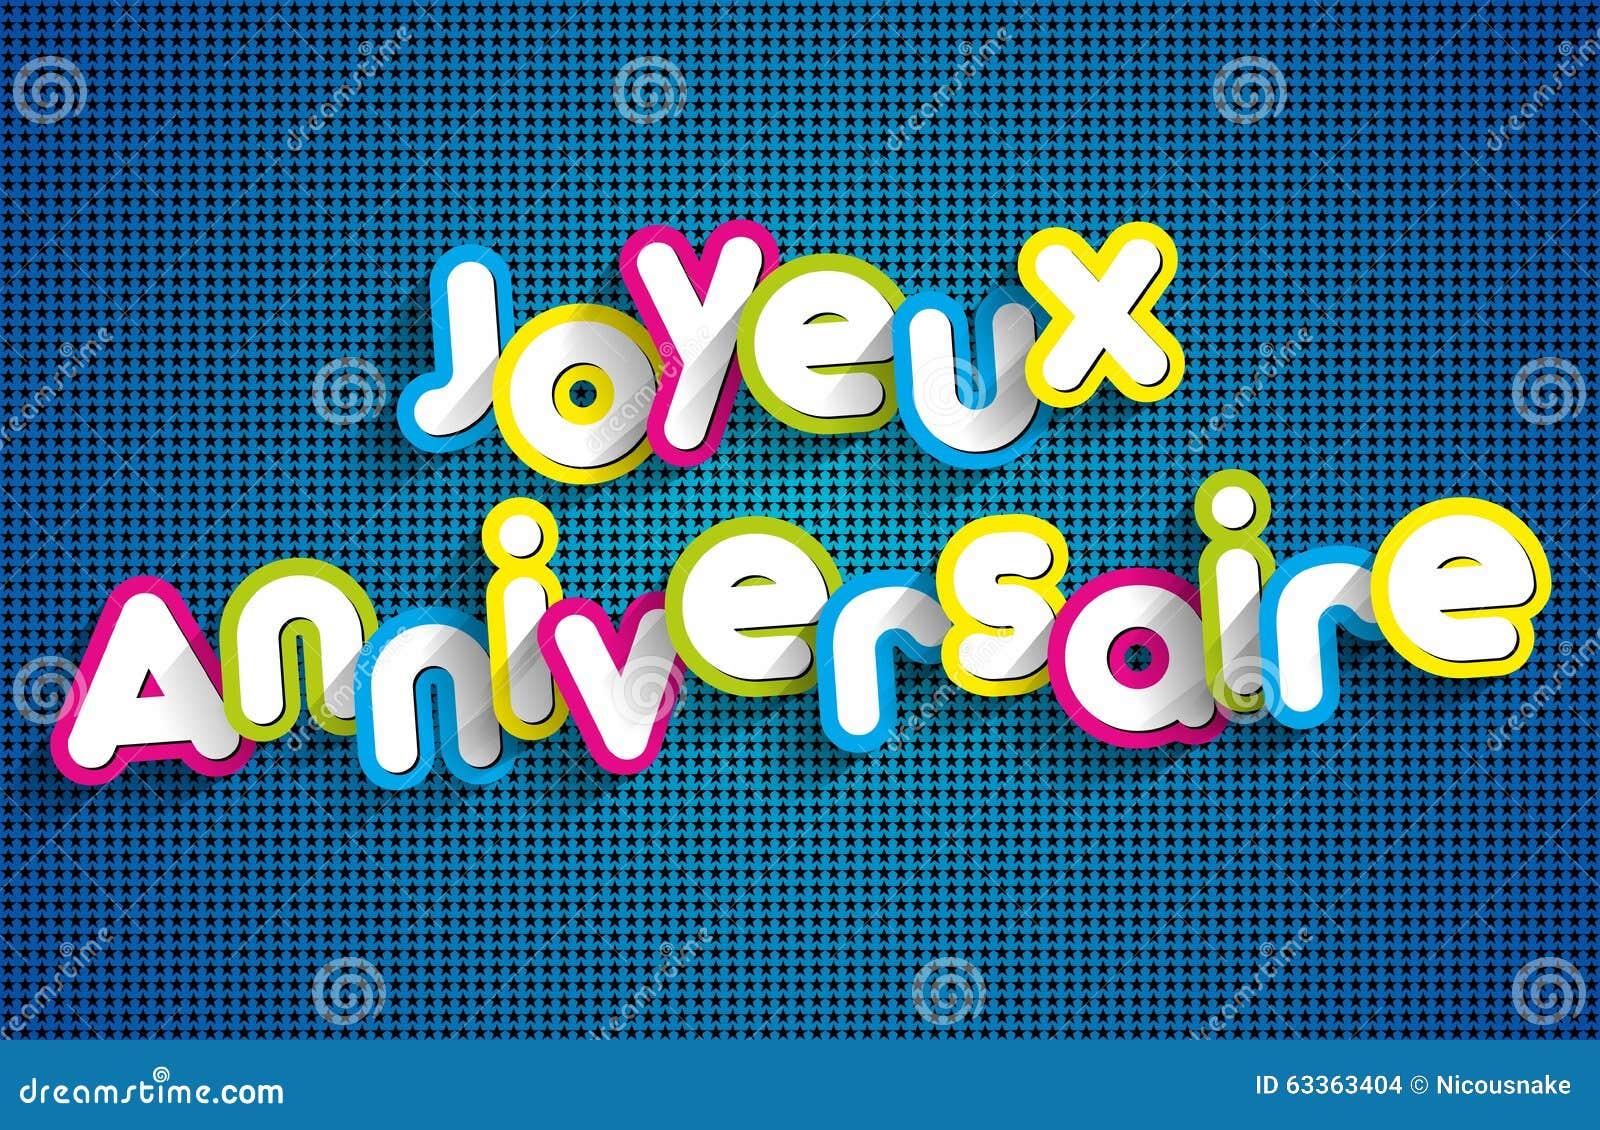 joyeux anniversaire happy birthday in french stock blue ribbon vector art free pabst blue ribbon vector